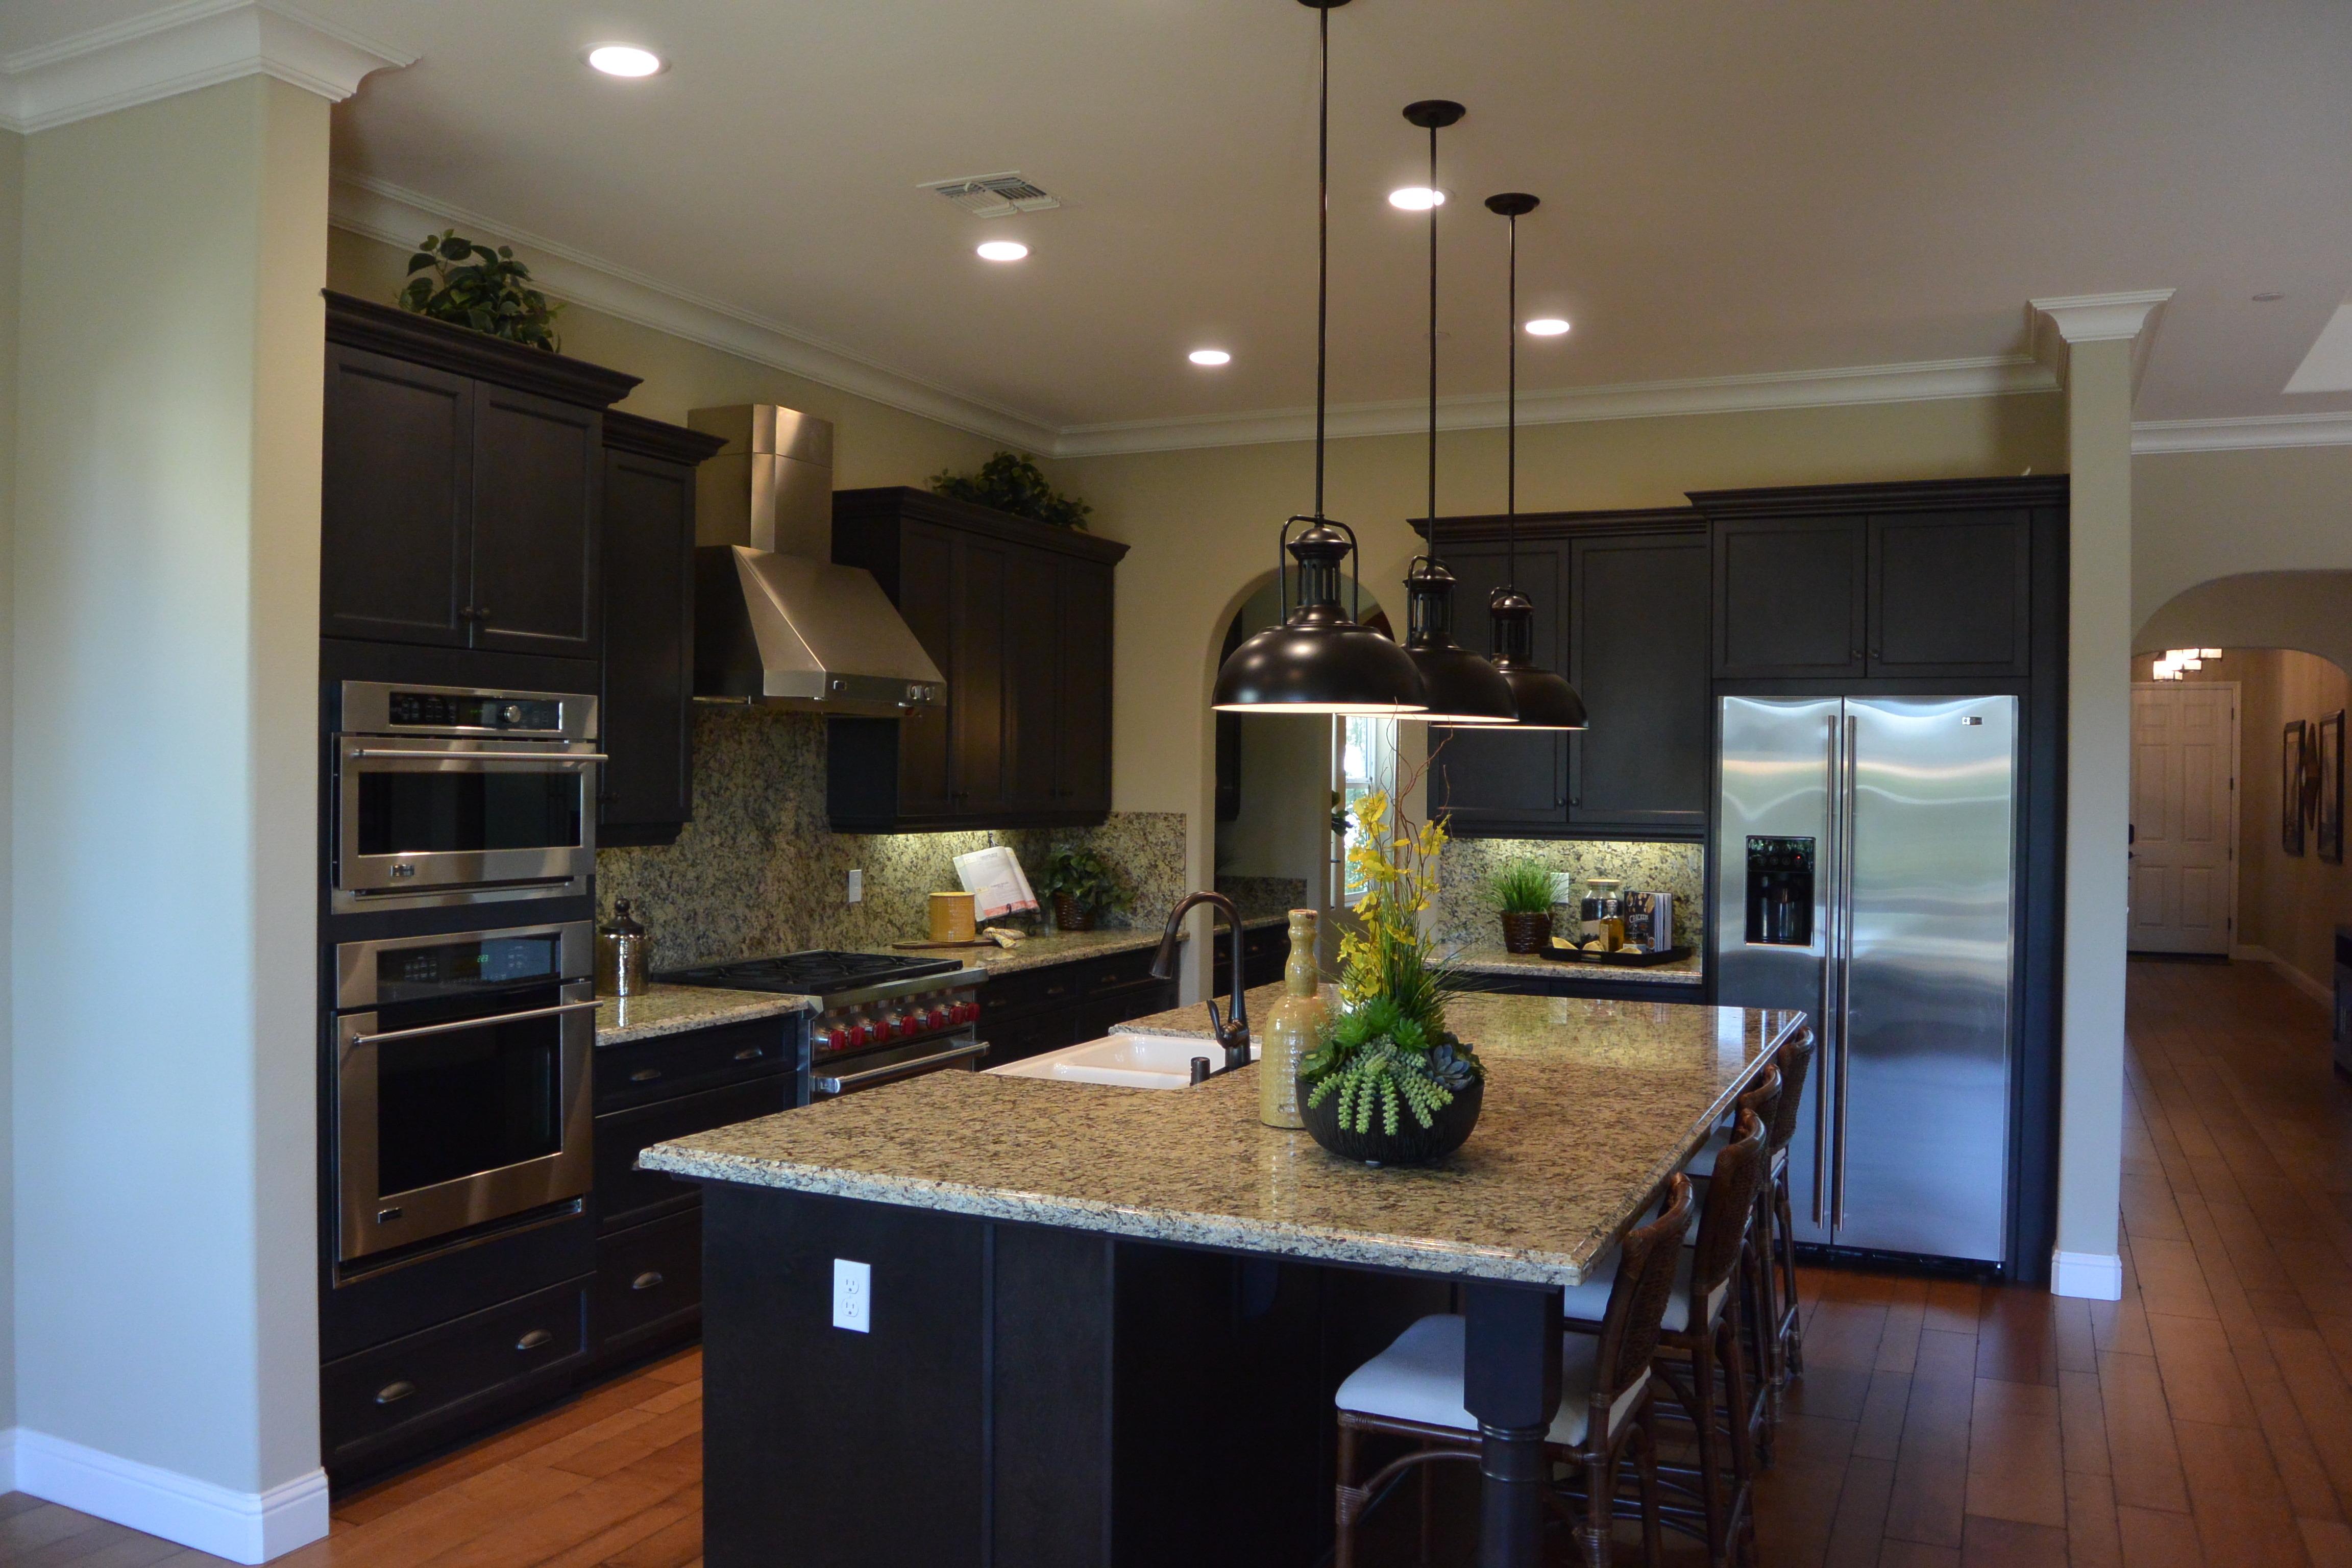 New Wilson Windsor Estates Homes Temperance Shepherd Clovis Ca 93619